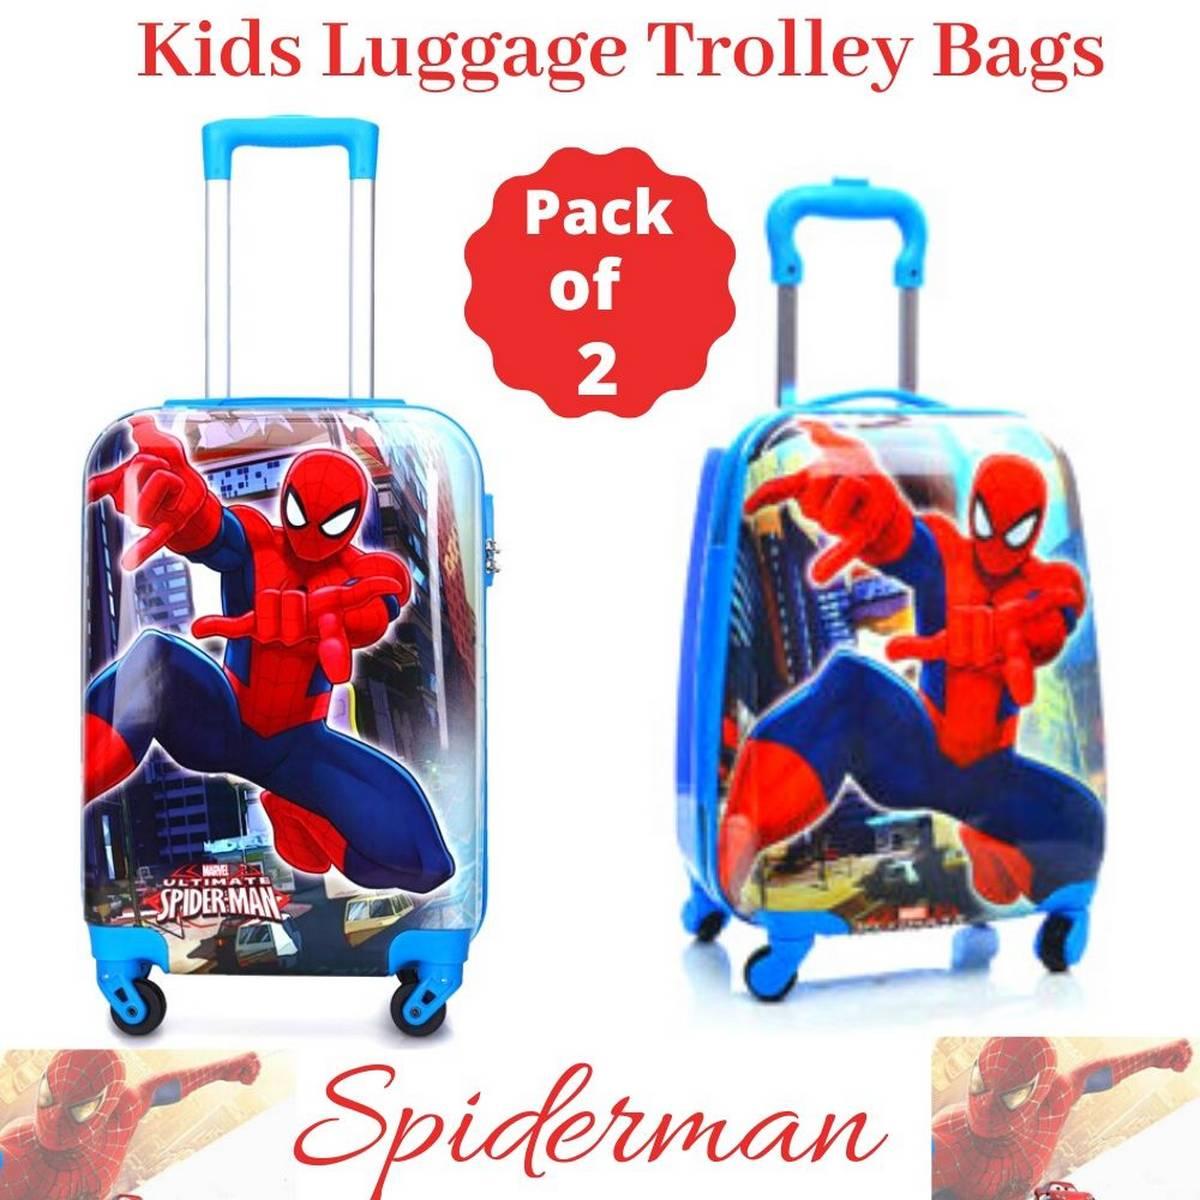 -25% Princess Sofia Hard Sided Luggage Trolley Bag for Kids Sweet Girl Princess Sofia Rolling Luggage Suitcase /Kids Travel Trolley Bag-